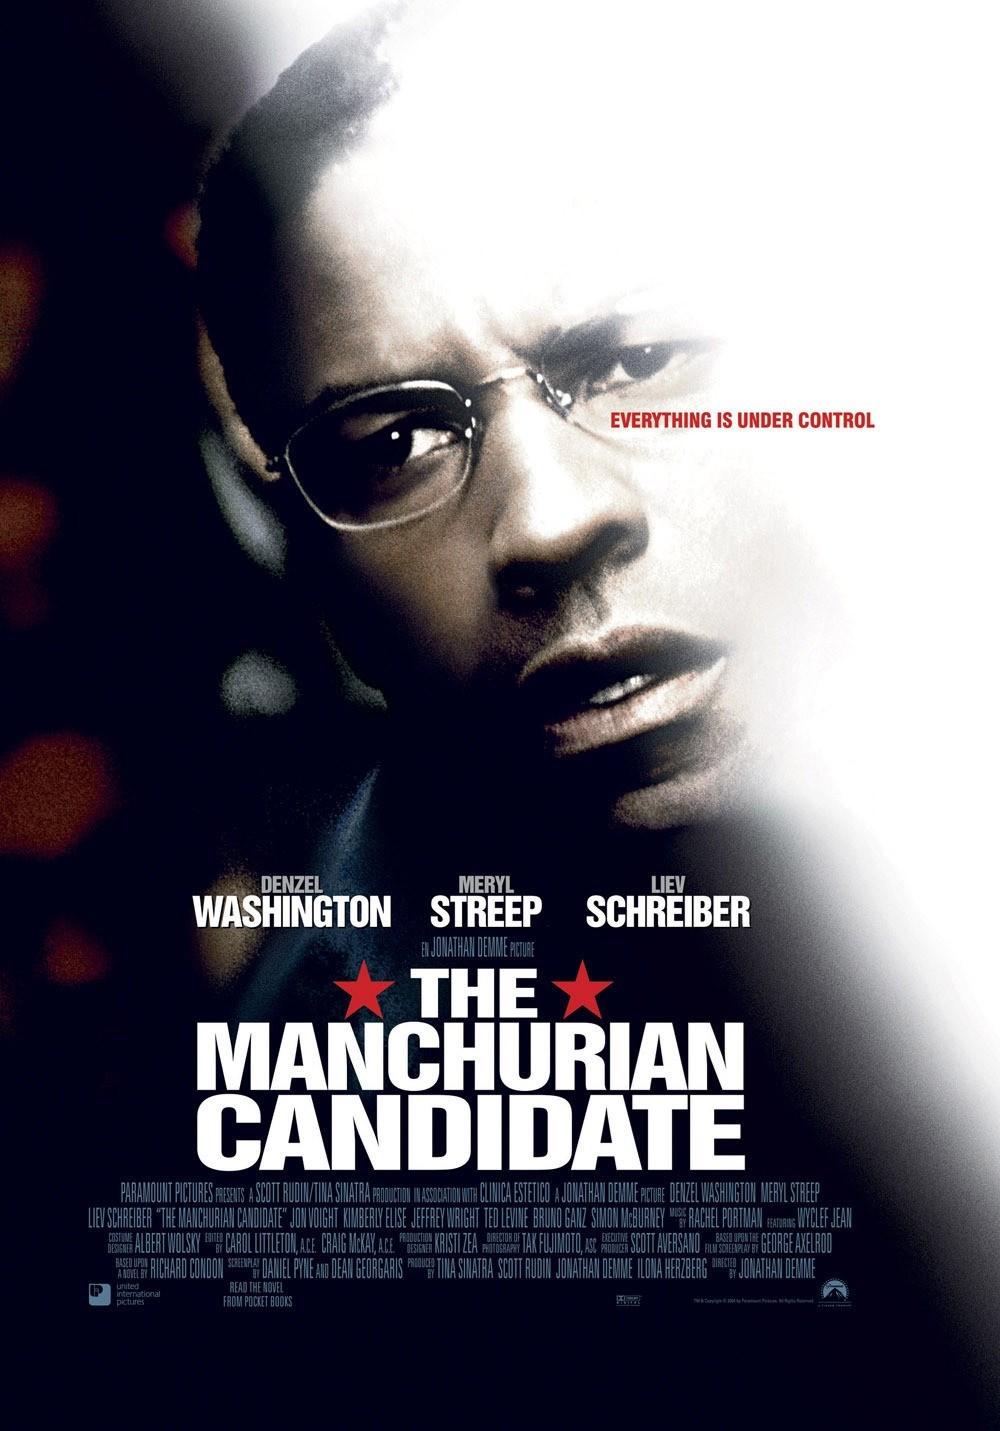 The Manchurian Candidate 2004 Imdb